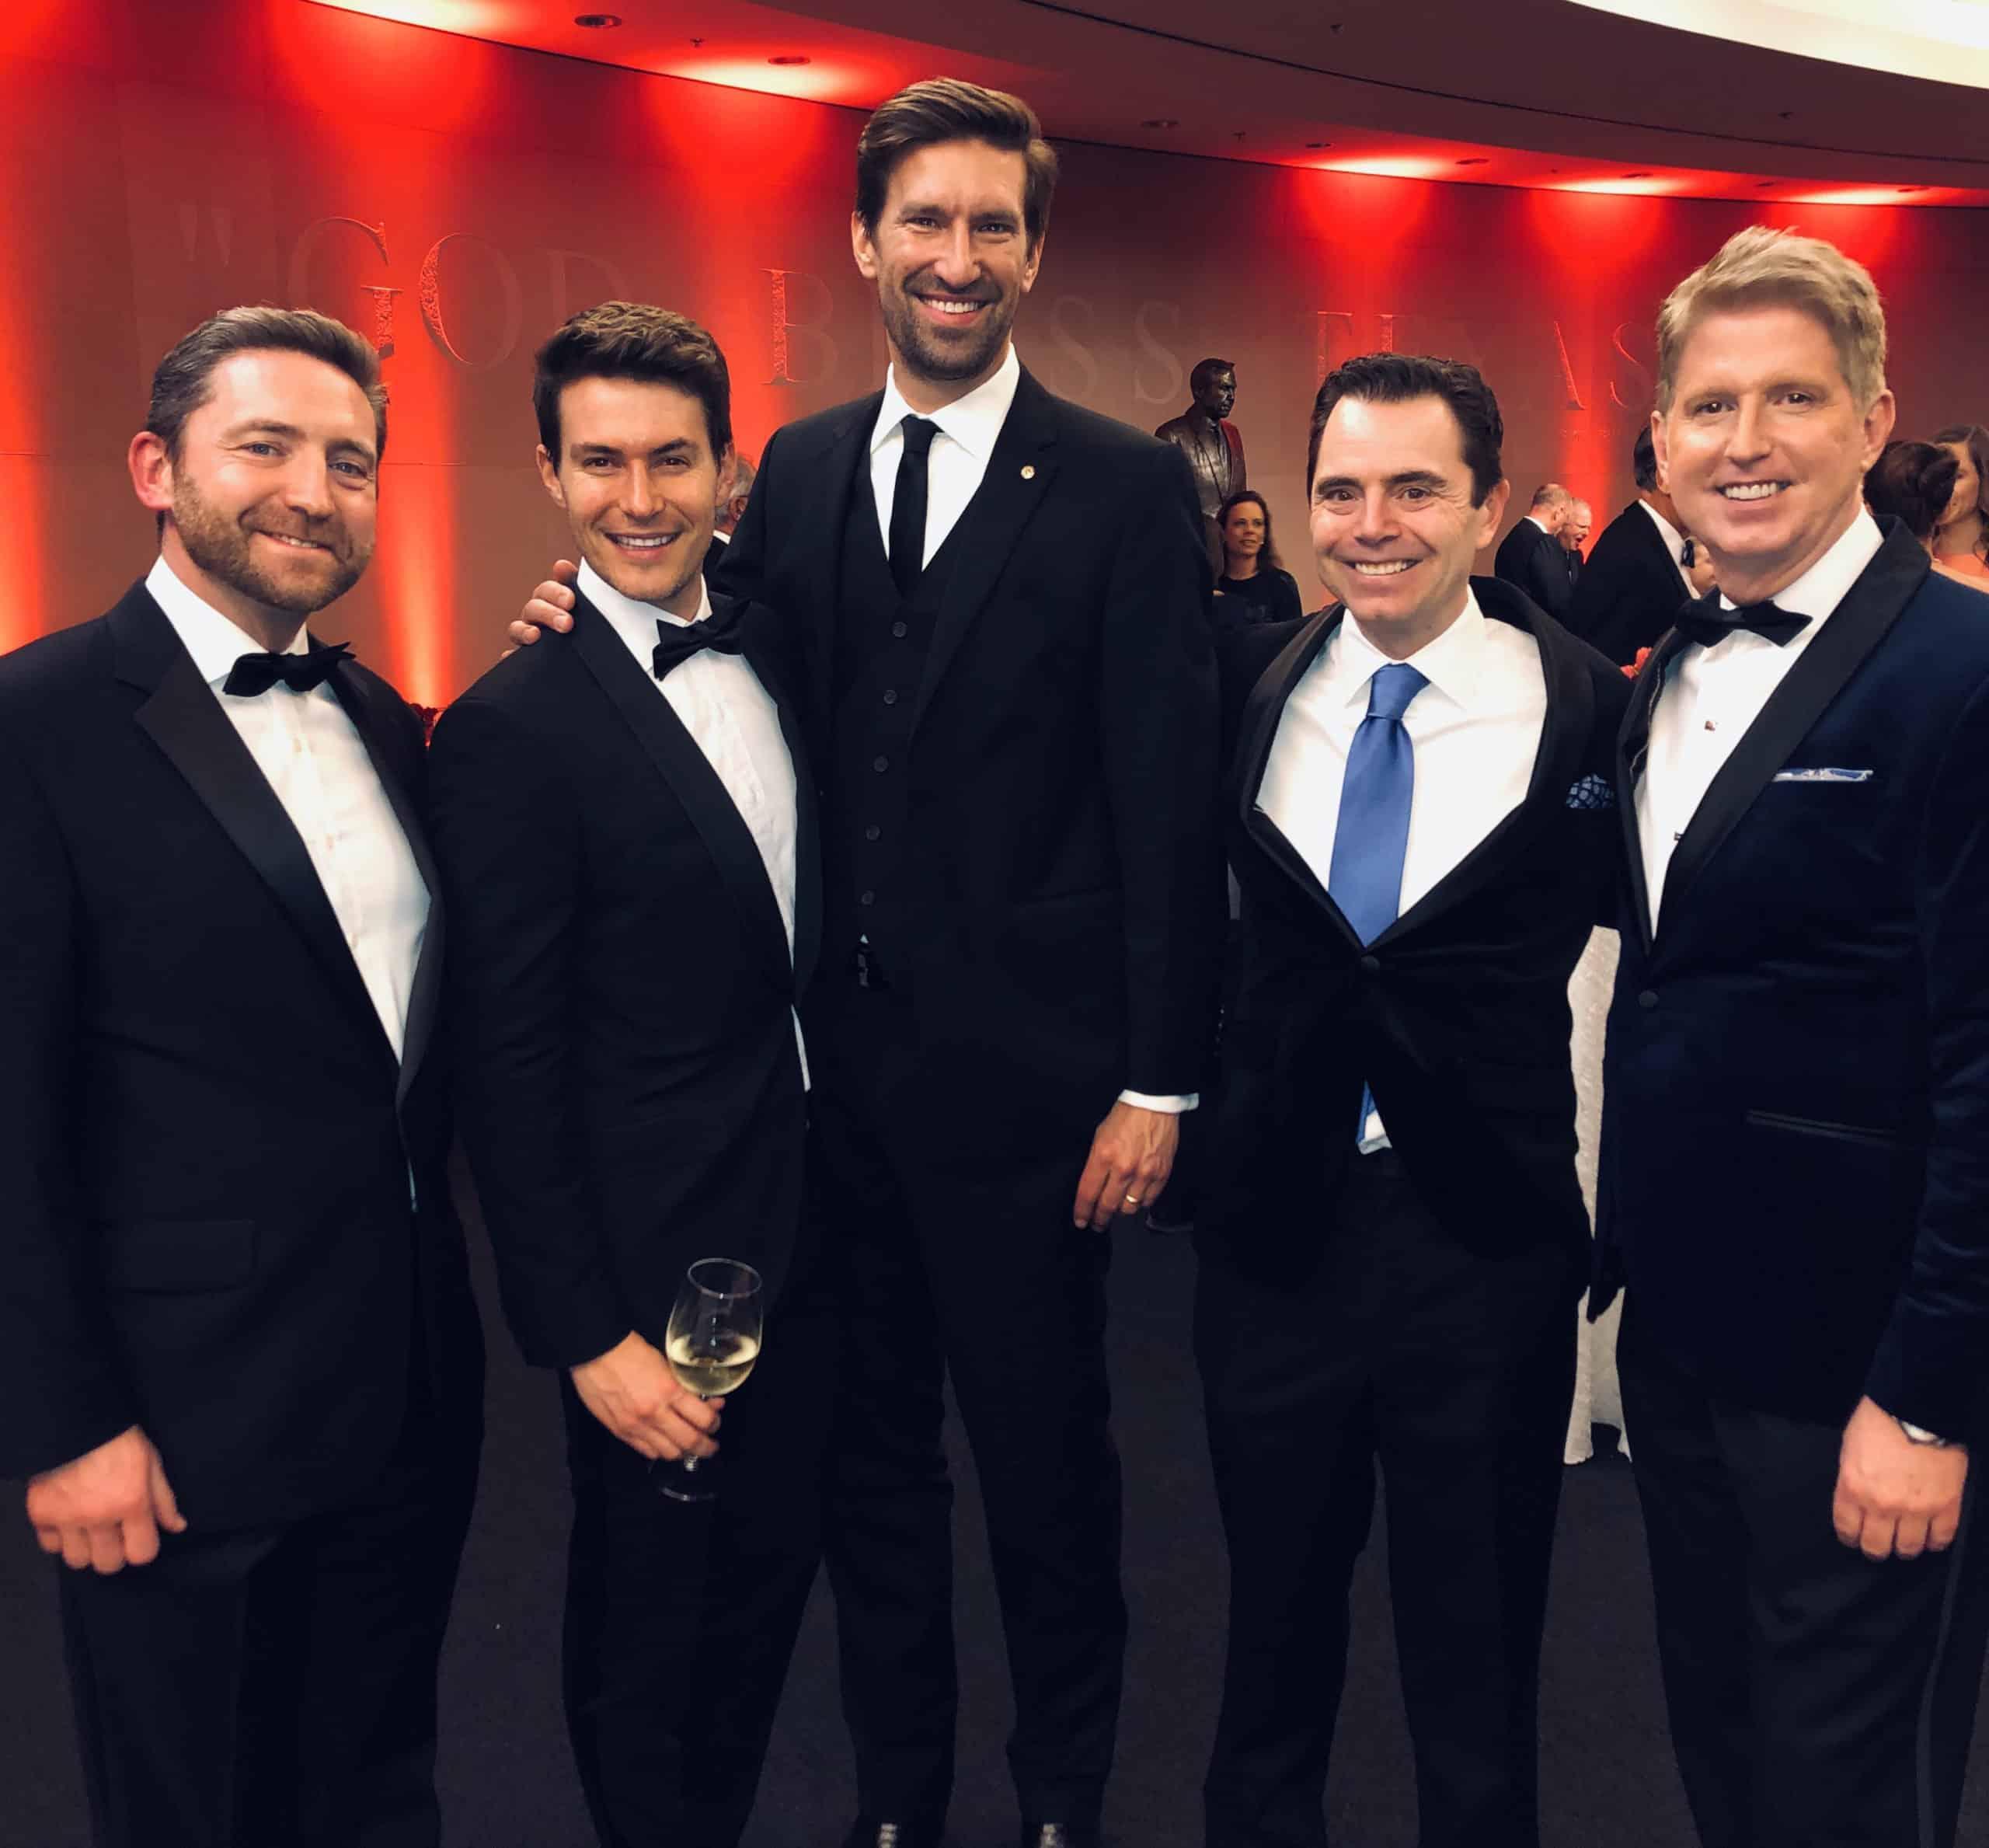 Hon. Adrian Farrell, Brendan Bujold and Spencer Cronk _ Rob Giardinelli and Lance Avery Morgan